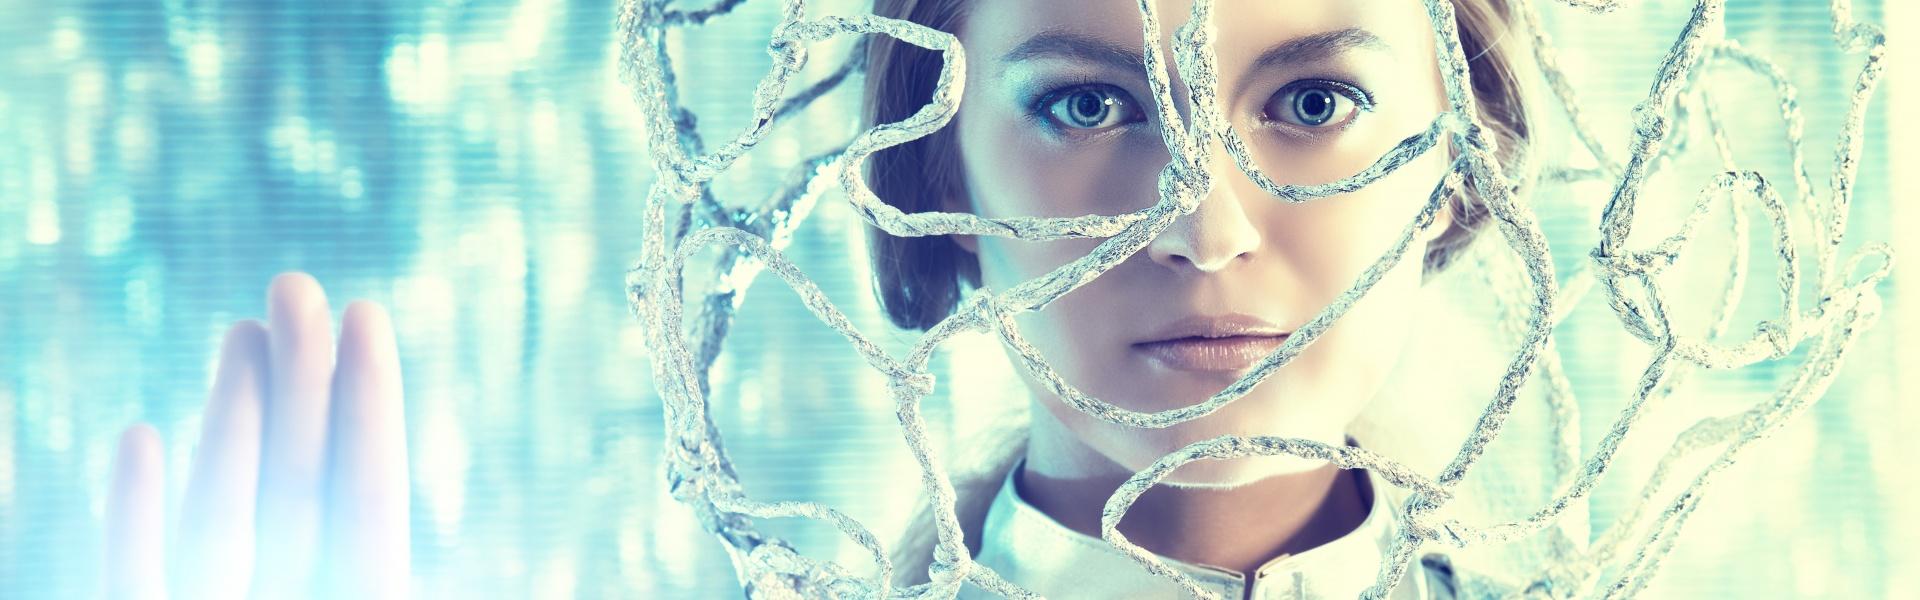 Bellesa Futurista